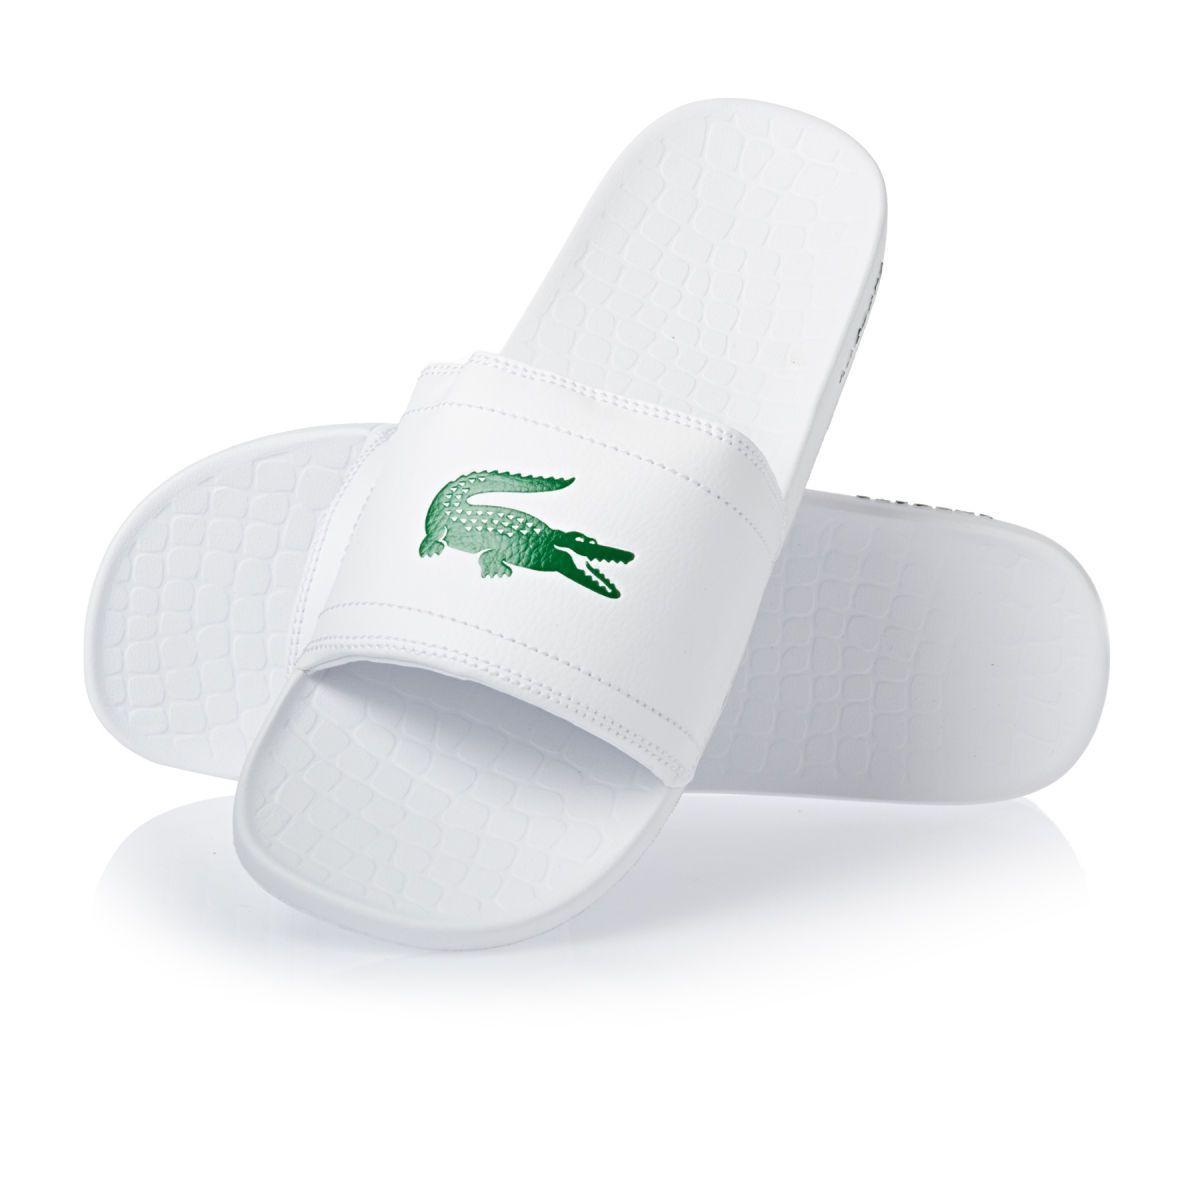 Womens lacoste sandals - Lacoste Fraisier Flip Flops White Green